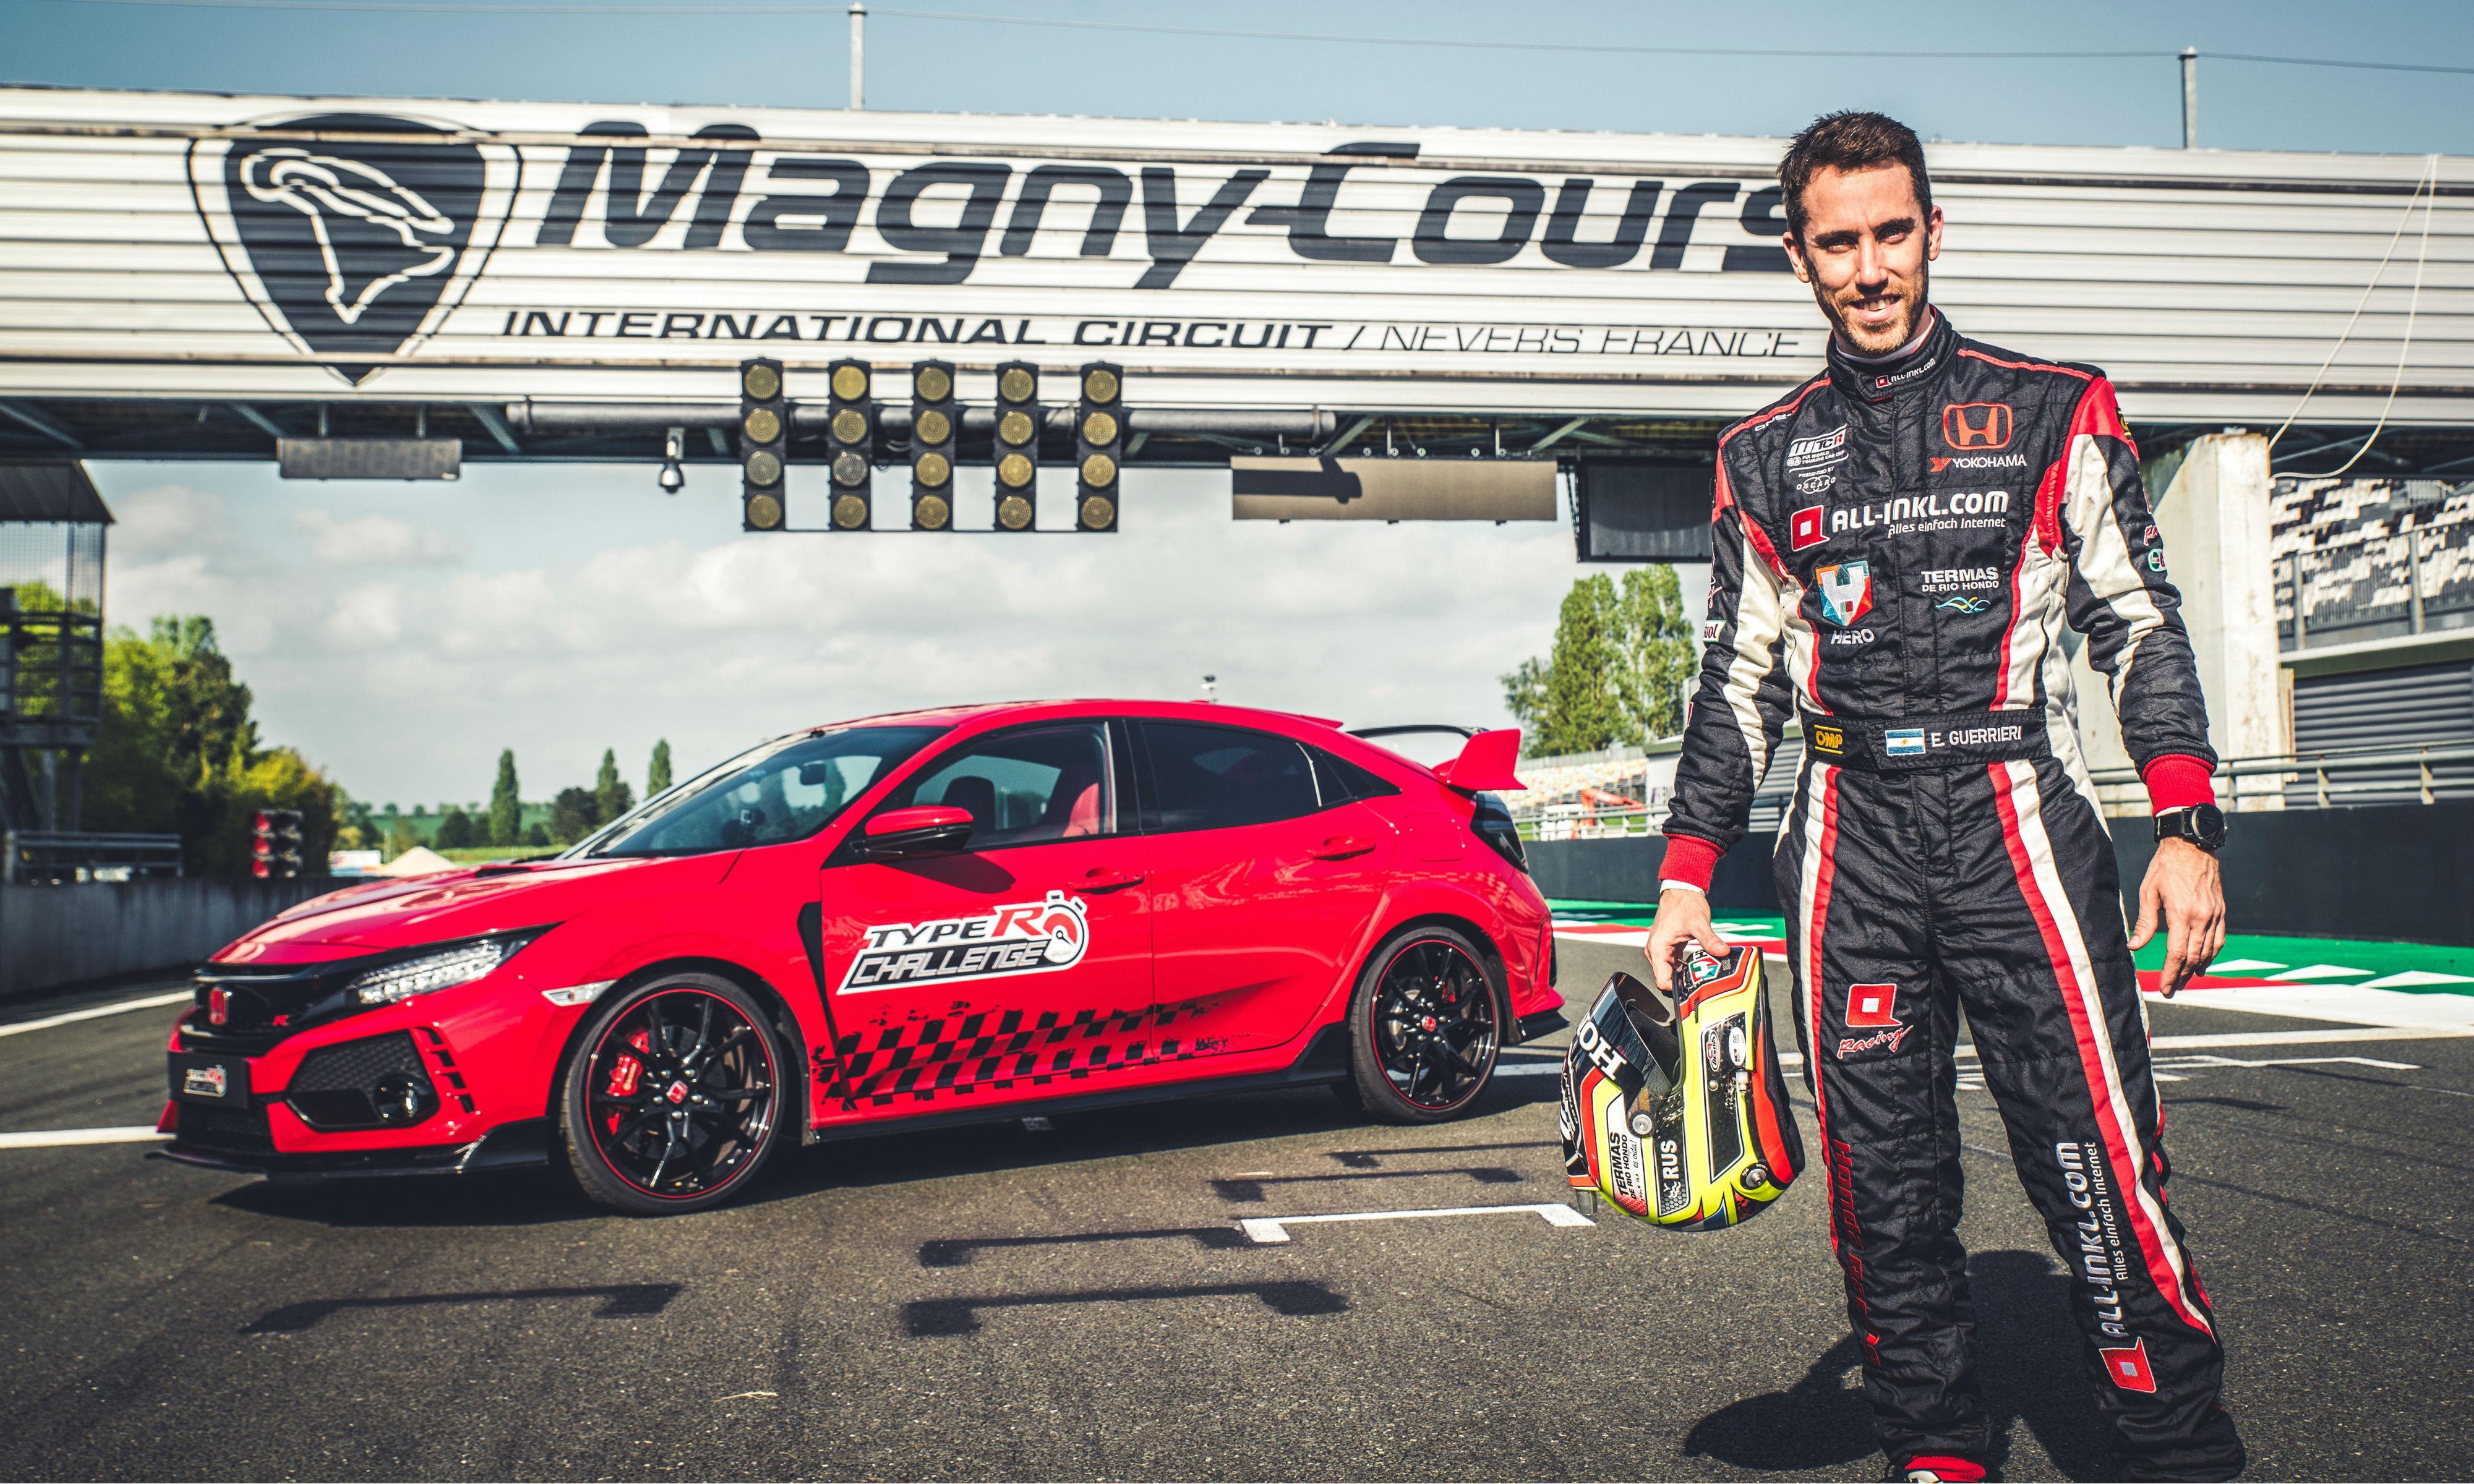 Nurburgring Lap Record >> Honda Civic Type R sets new lap record at Magny-Cours GP ...